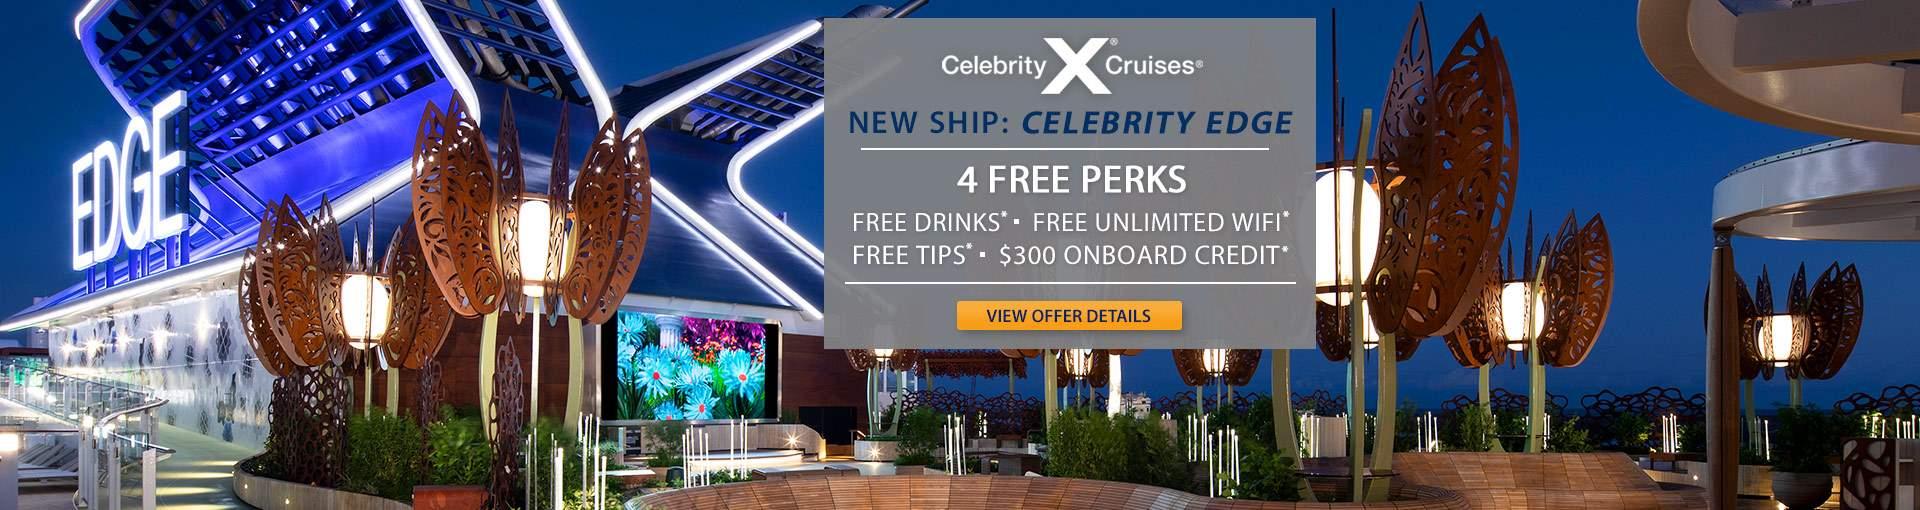 Celebrity Edge: 4 Free Perks